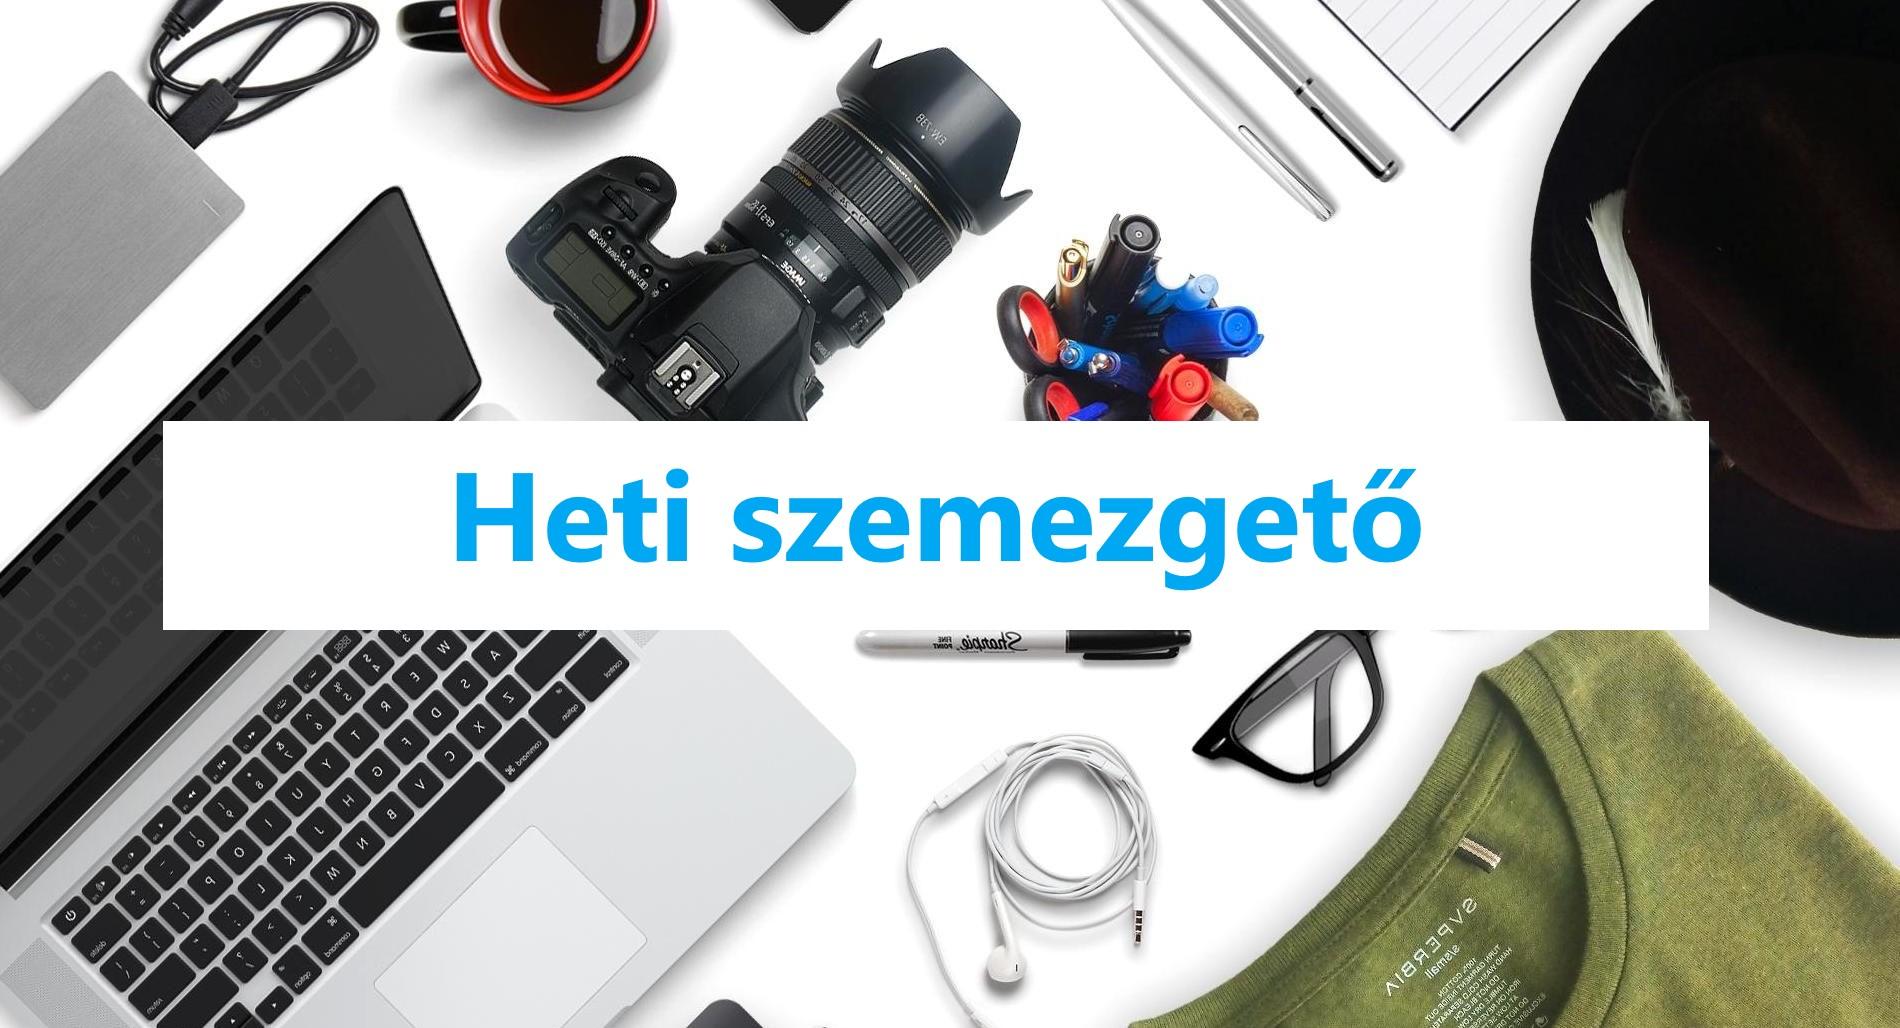 heti_szemezgeto_uj_94.jpg